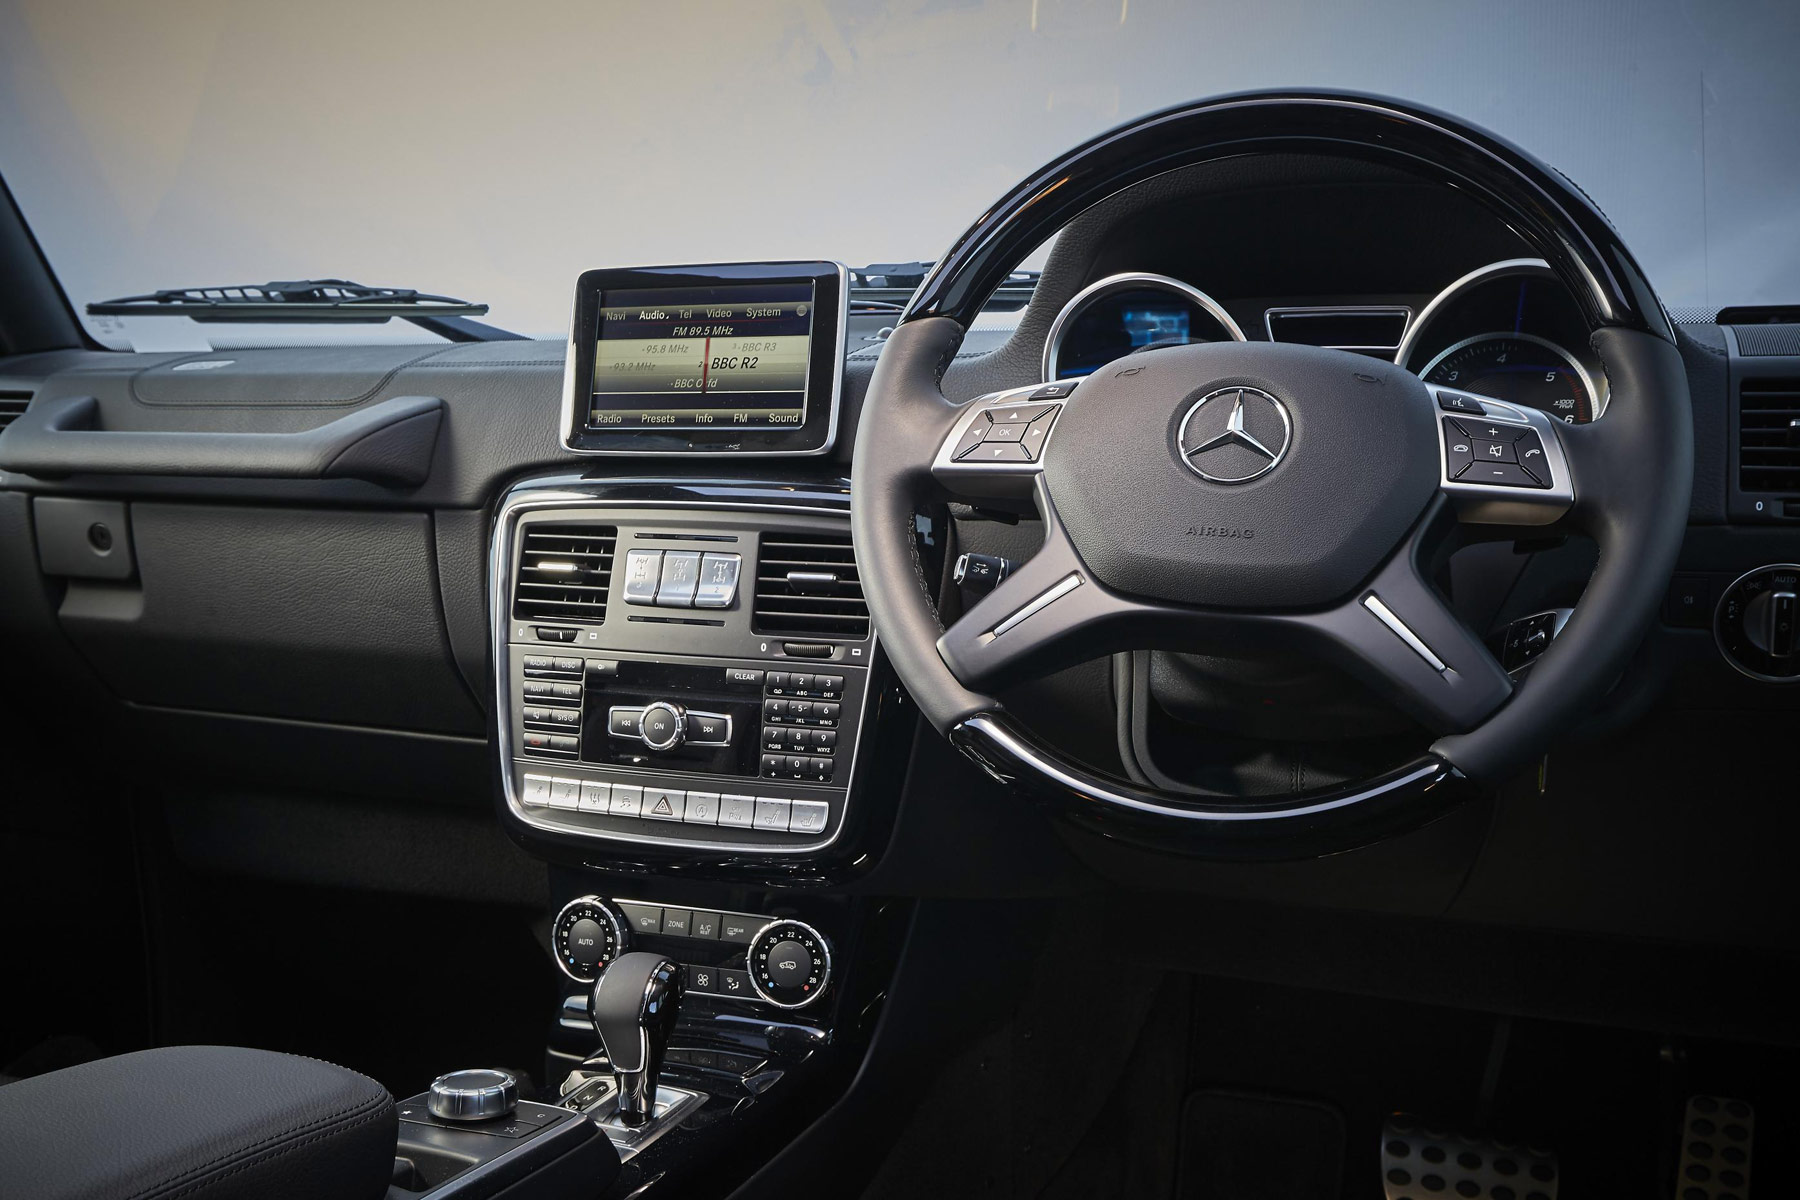 Dashboard of the Mercedes-Benz G-Class